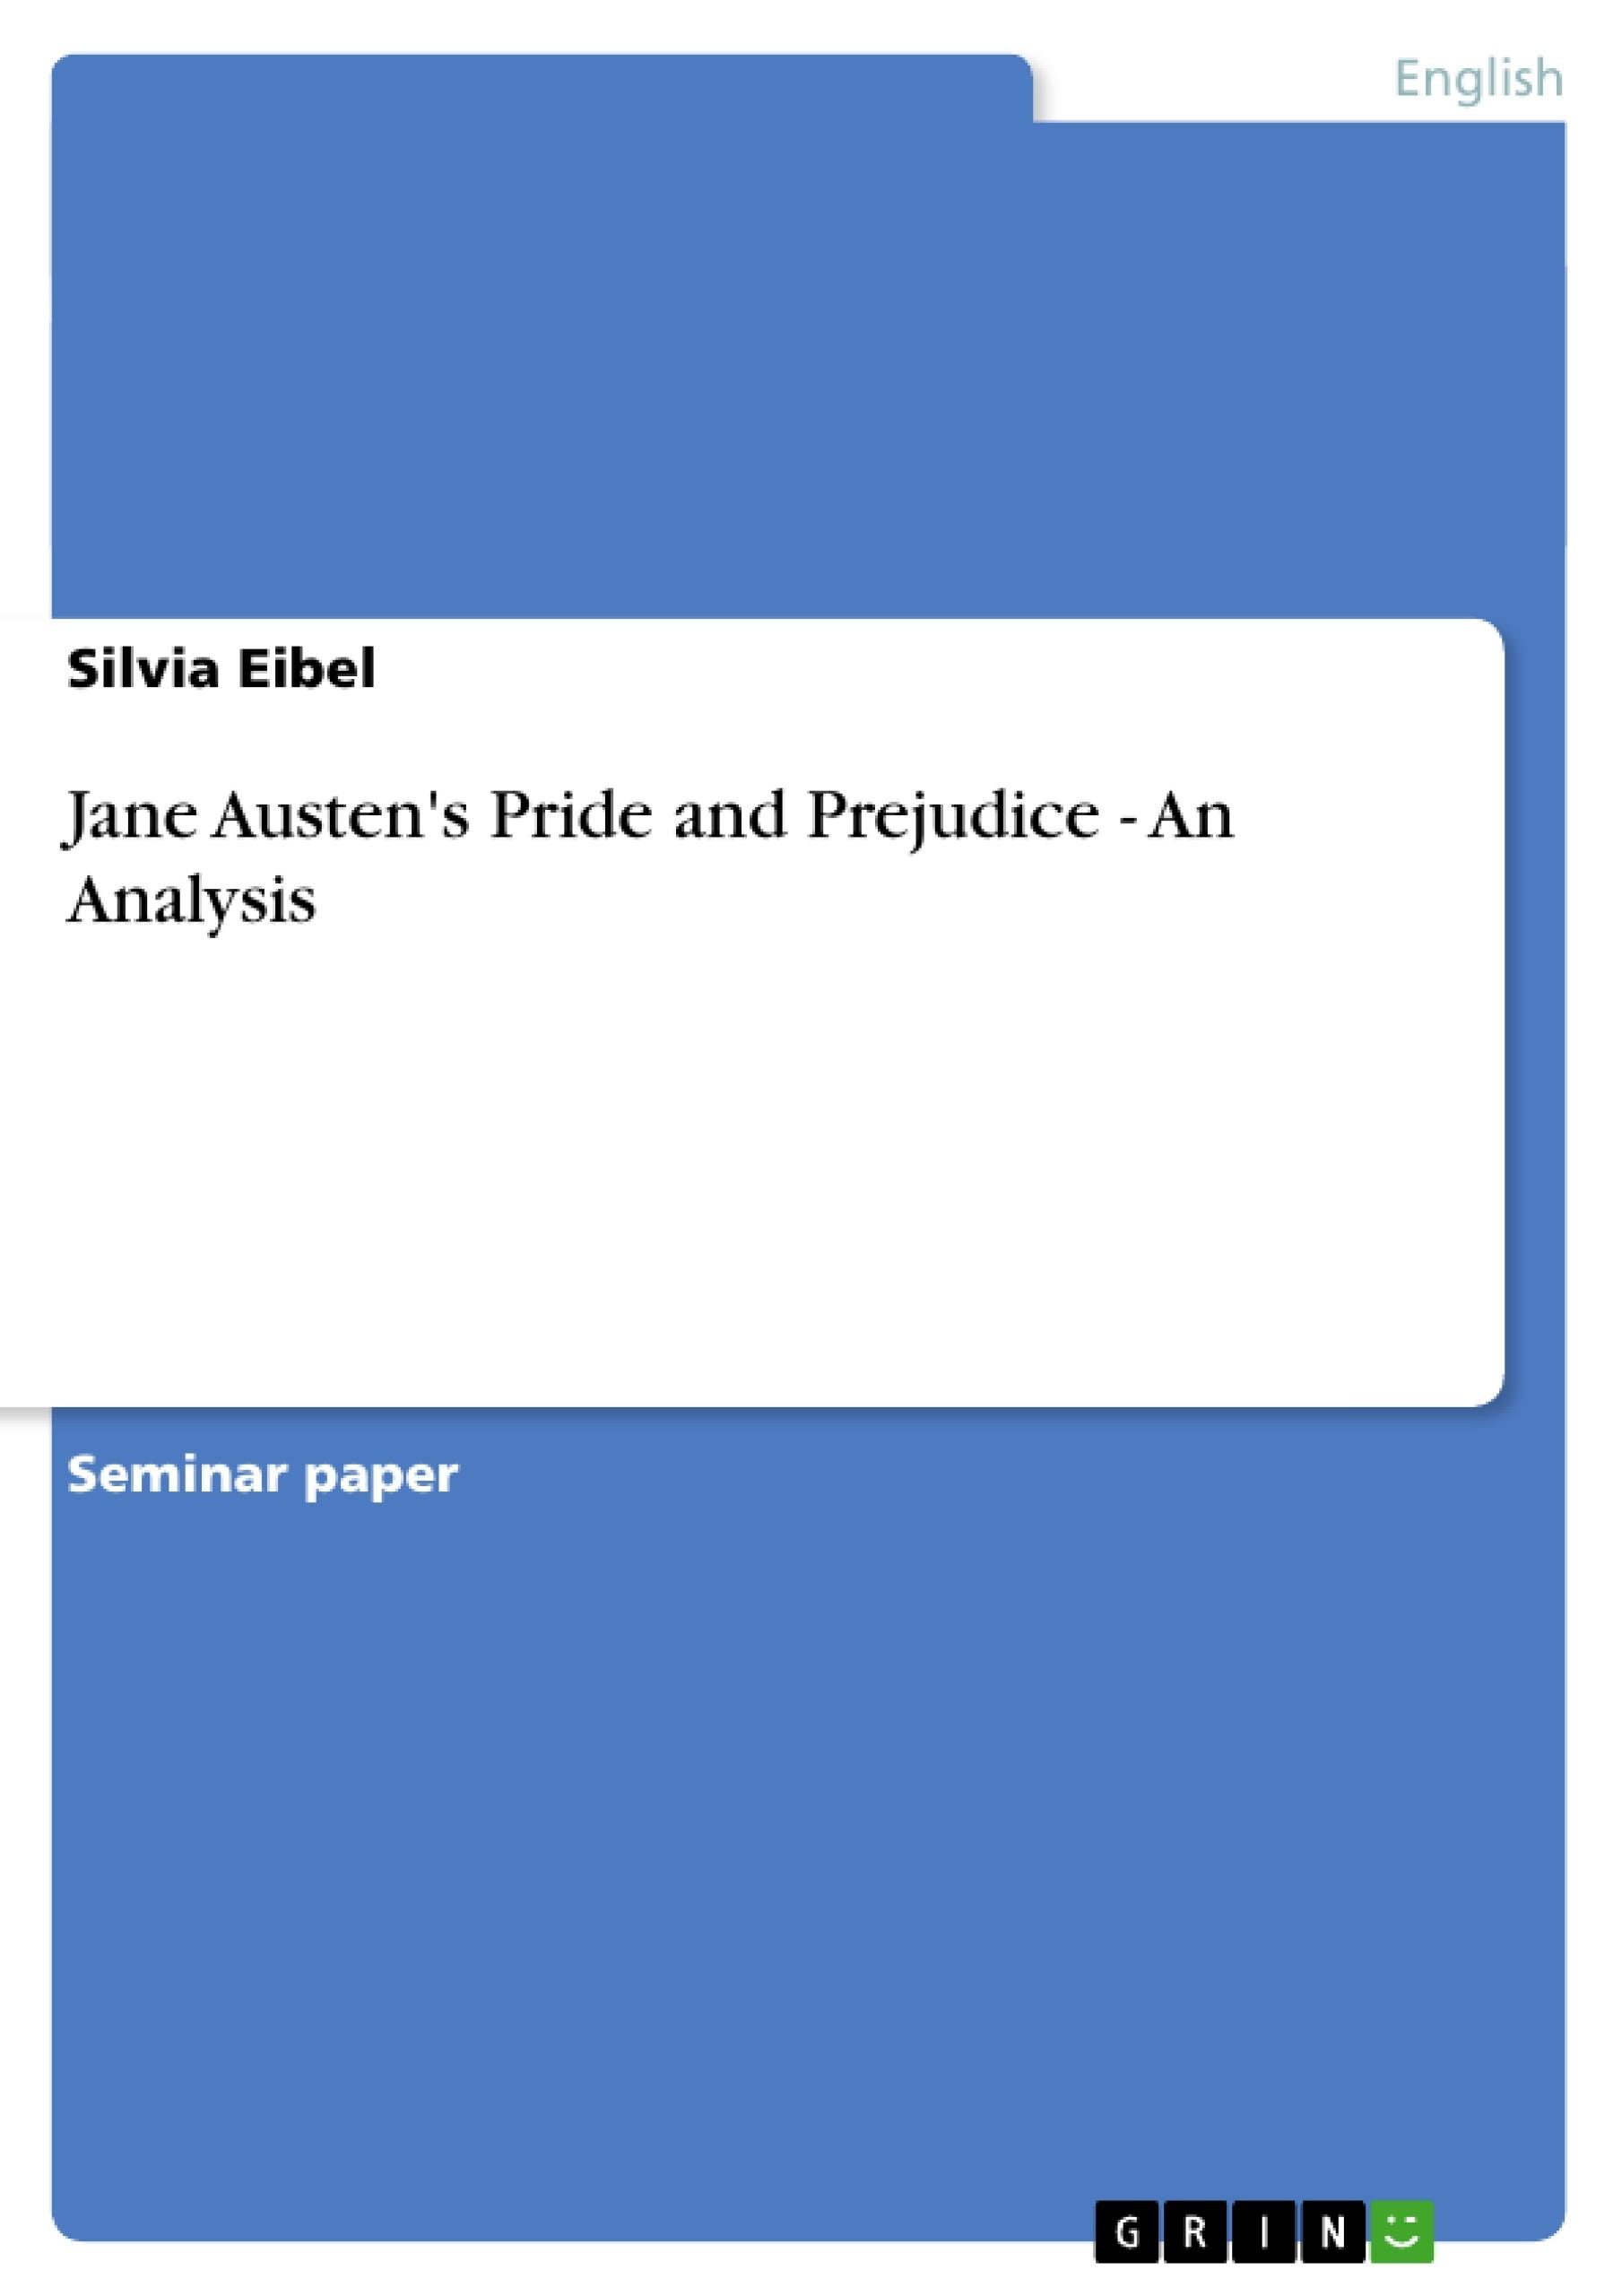 Title: Jane Austen's Pride and Prejudice - An Analysis